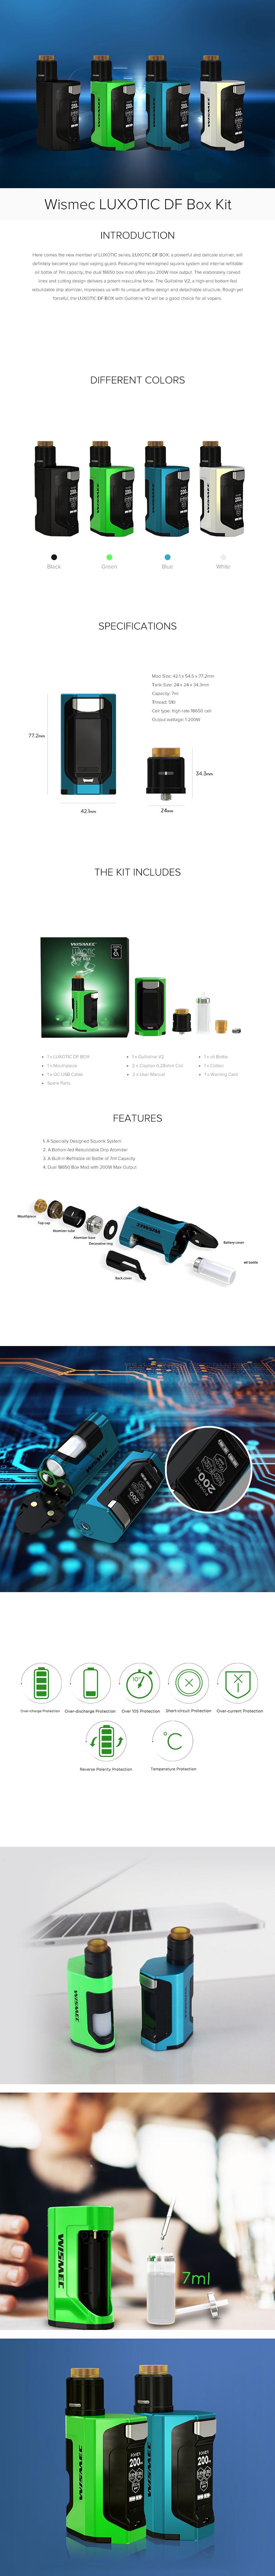 Wismec Luxotic DF 200W Kit